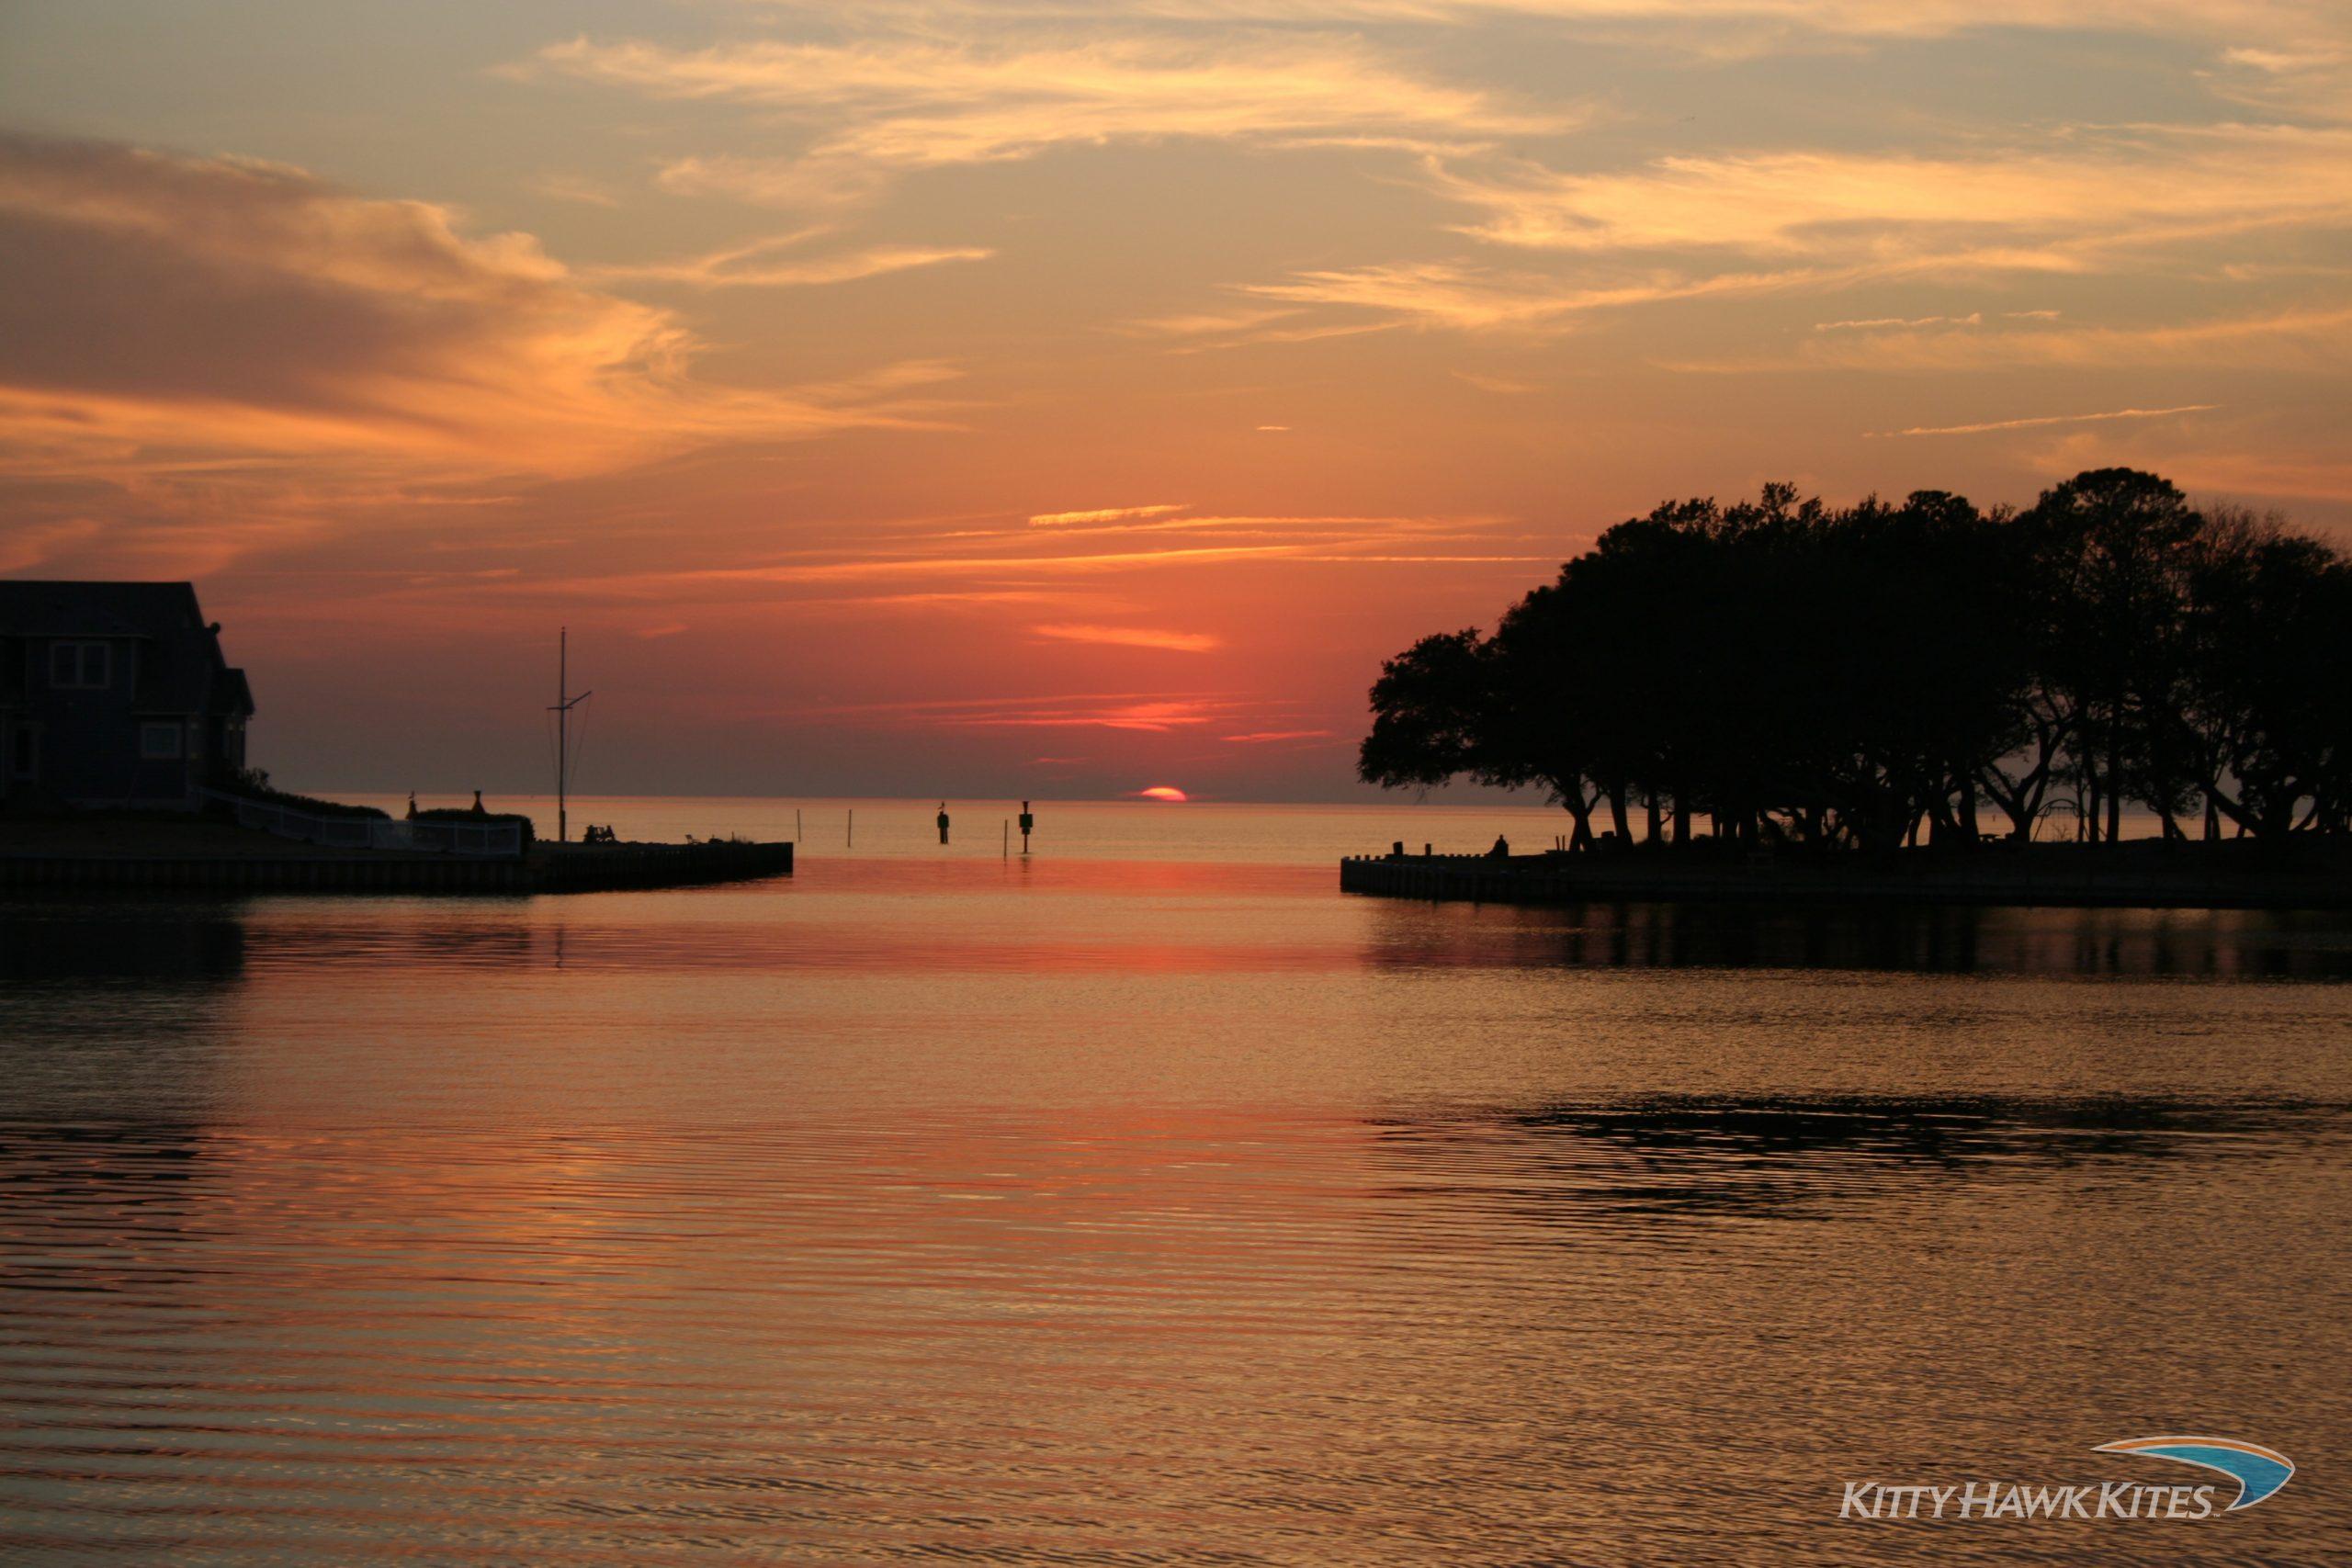 Albemarle-Pamlico sound at sunset